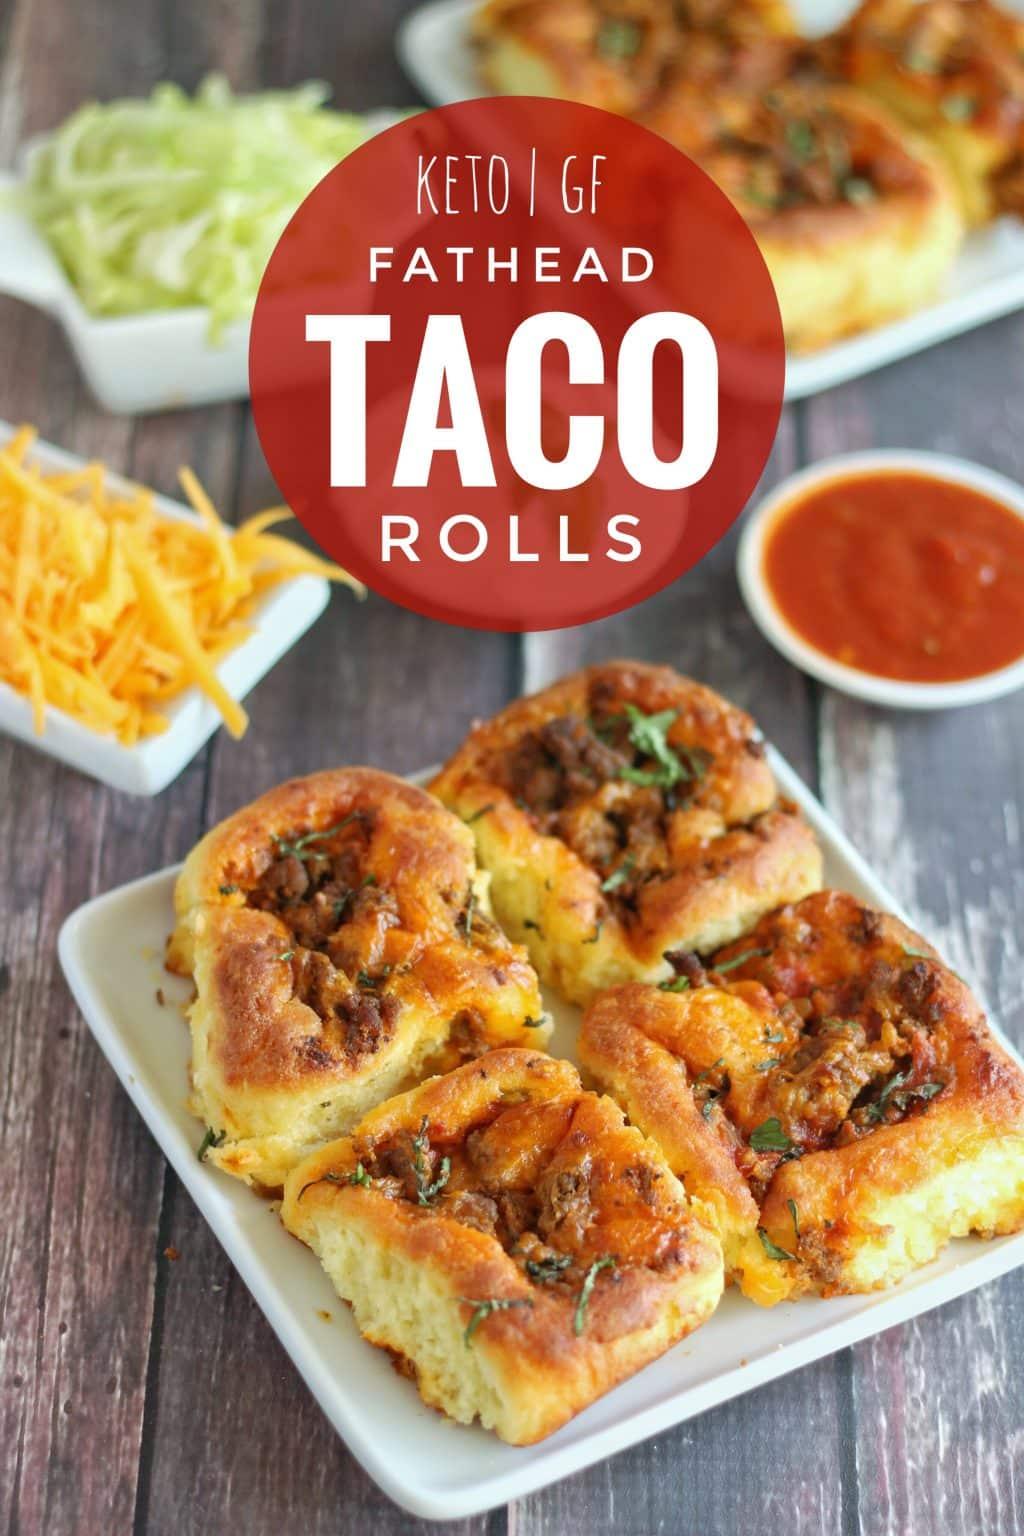 Keto Fathead Taco Rolls